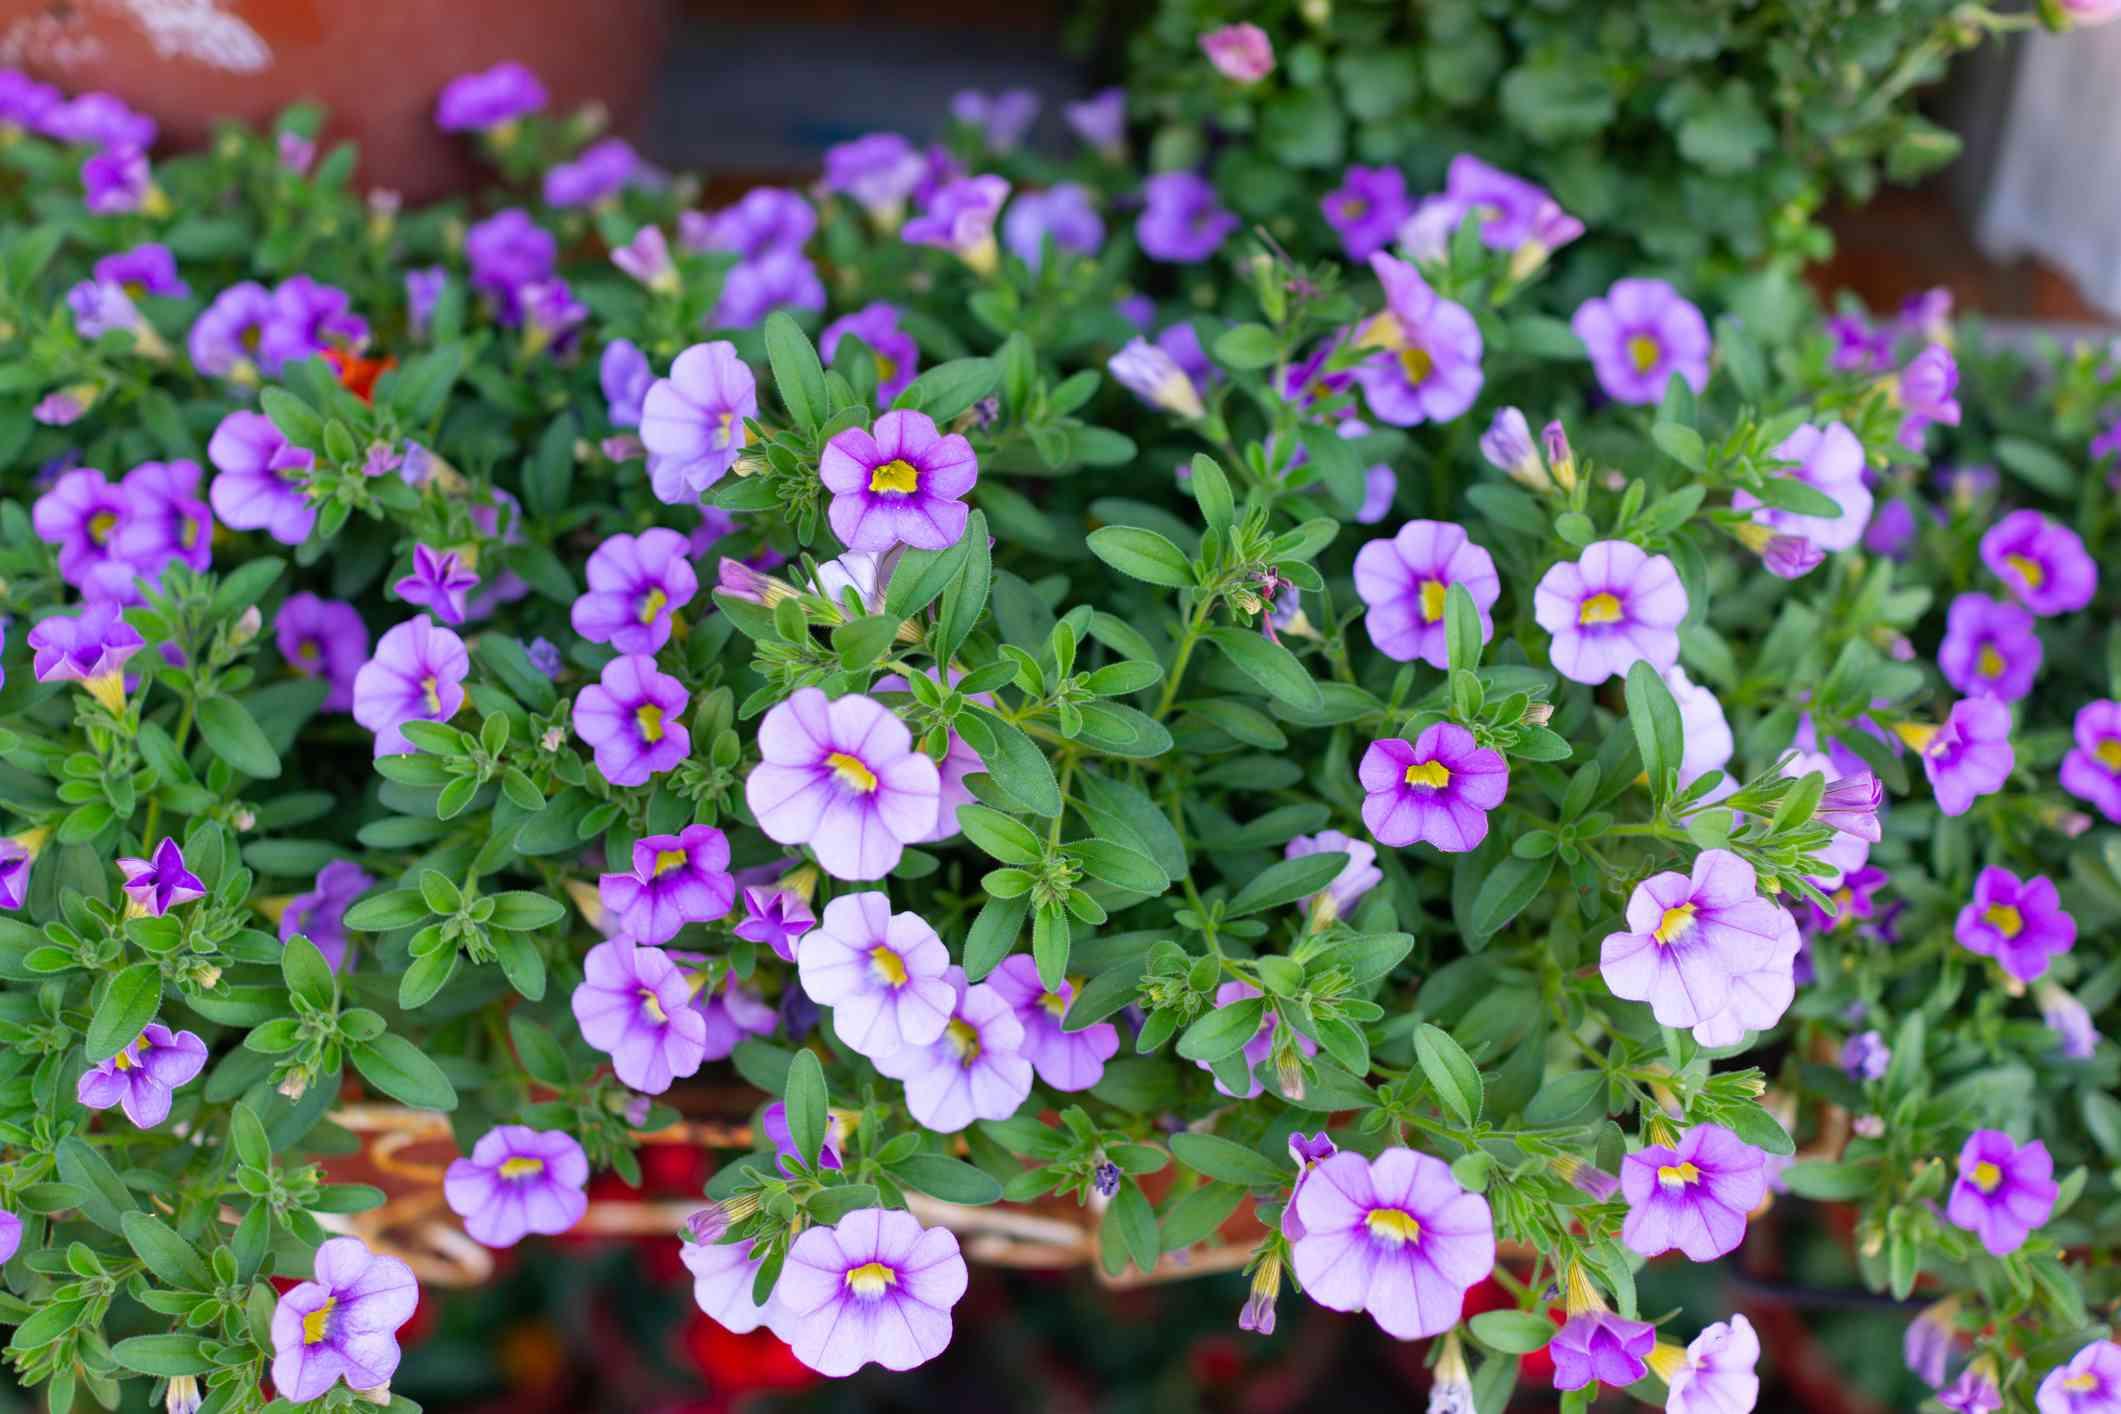 Bush of purple Calibrachoa flowers.